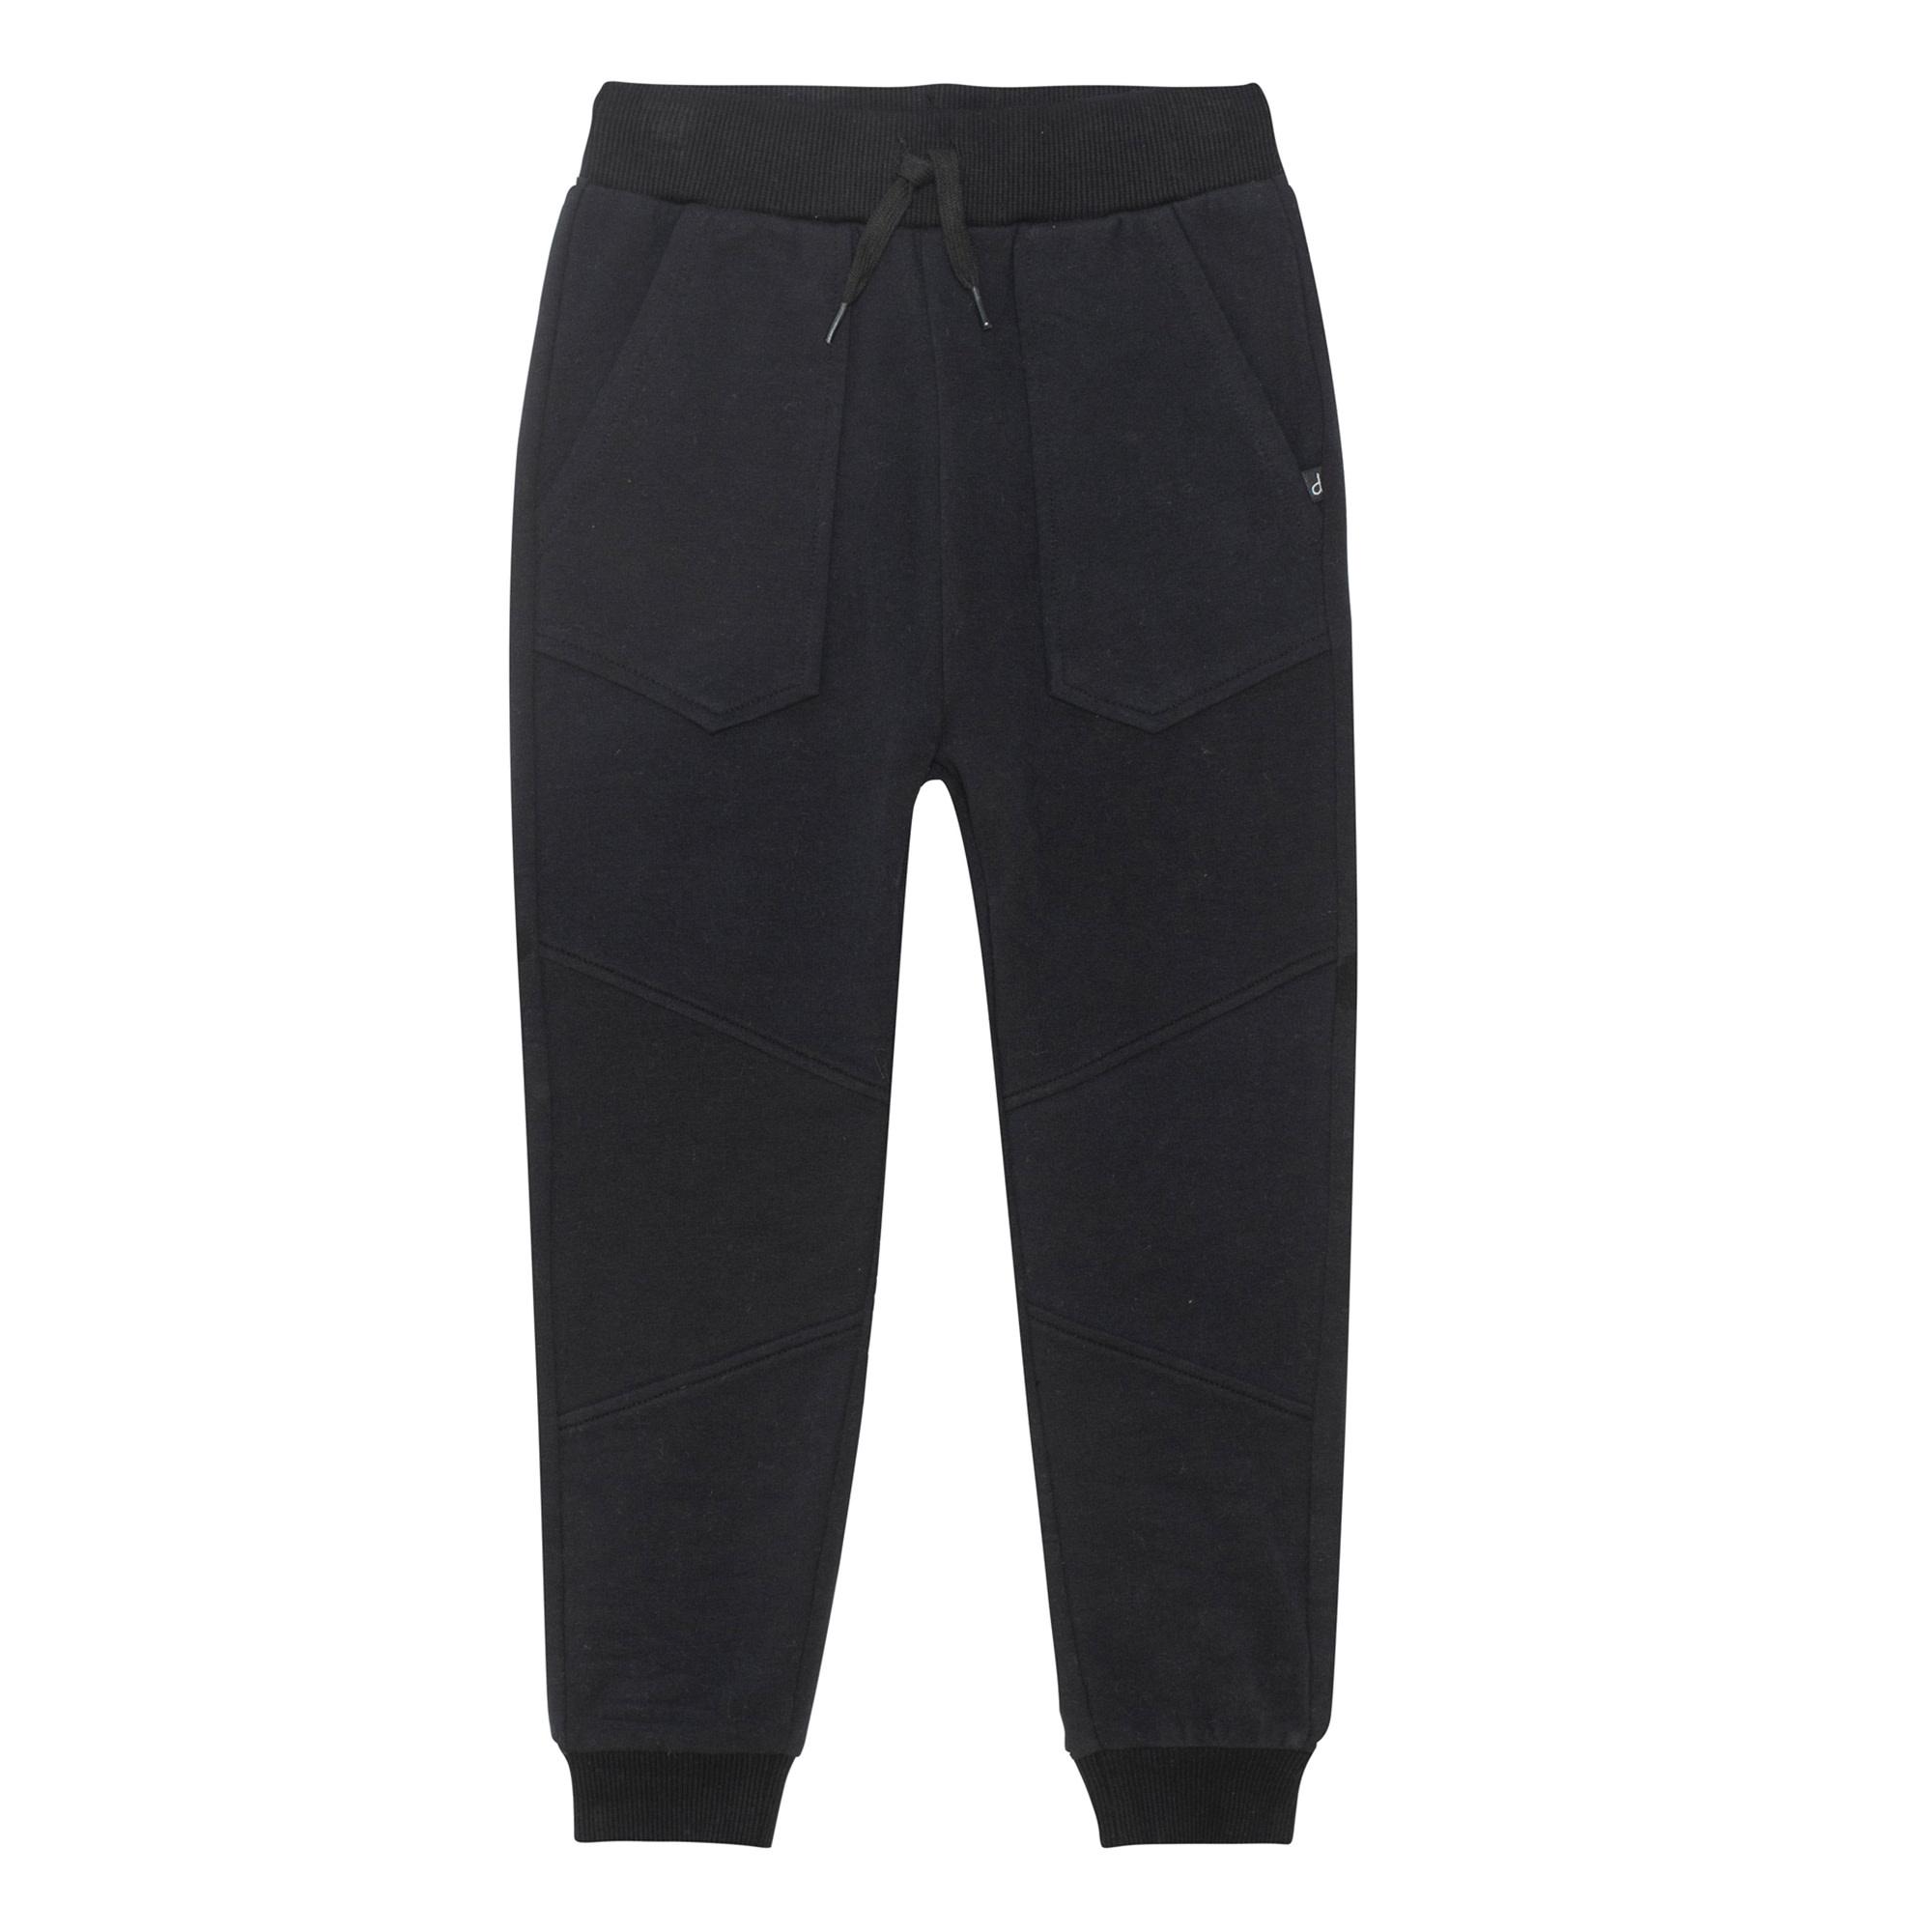 Pantalon Jogger Anthracite-7